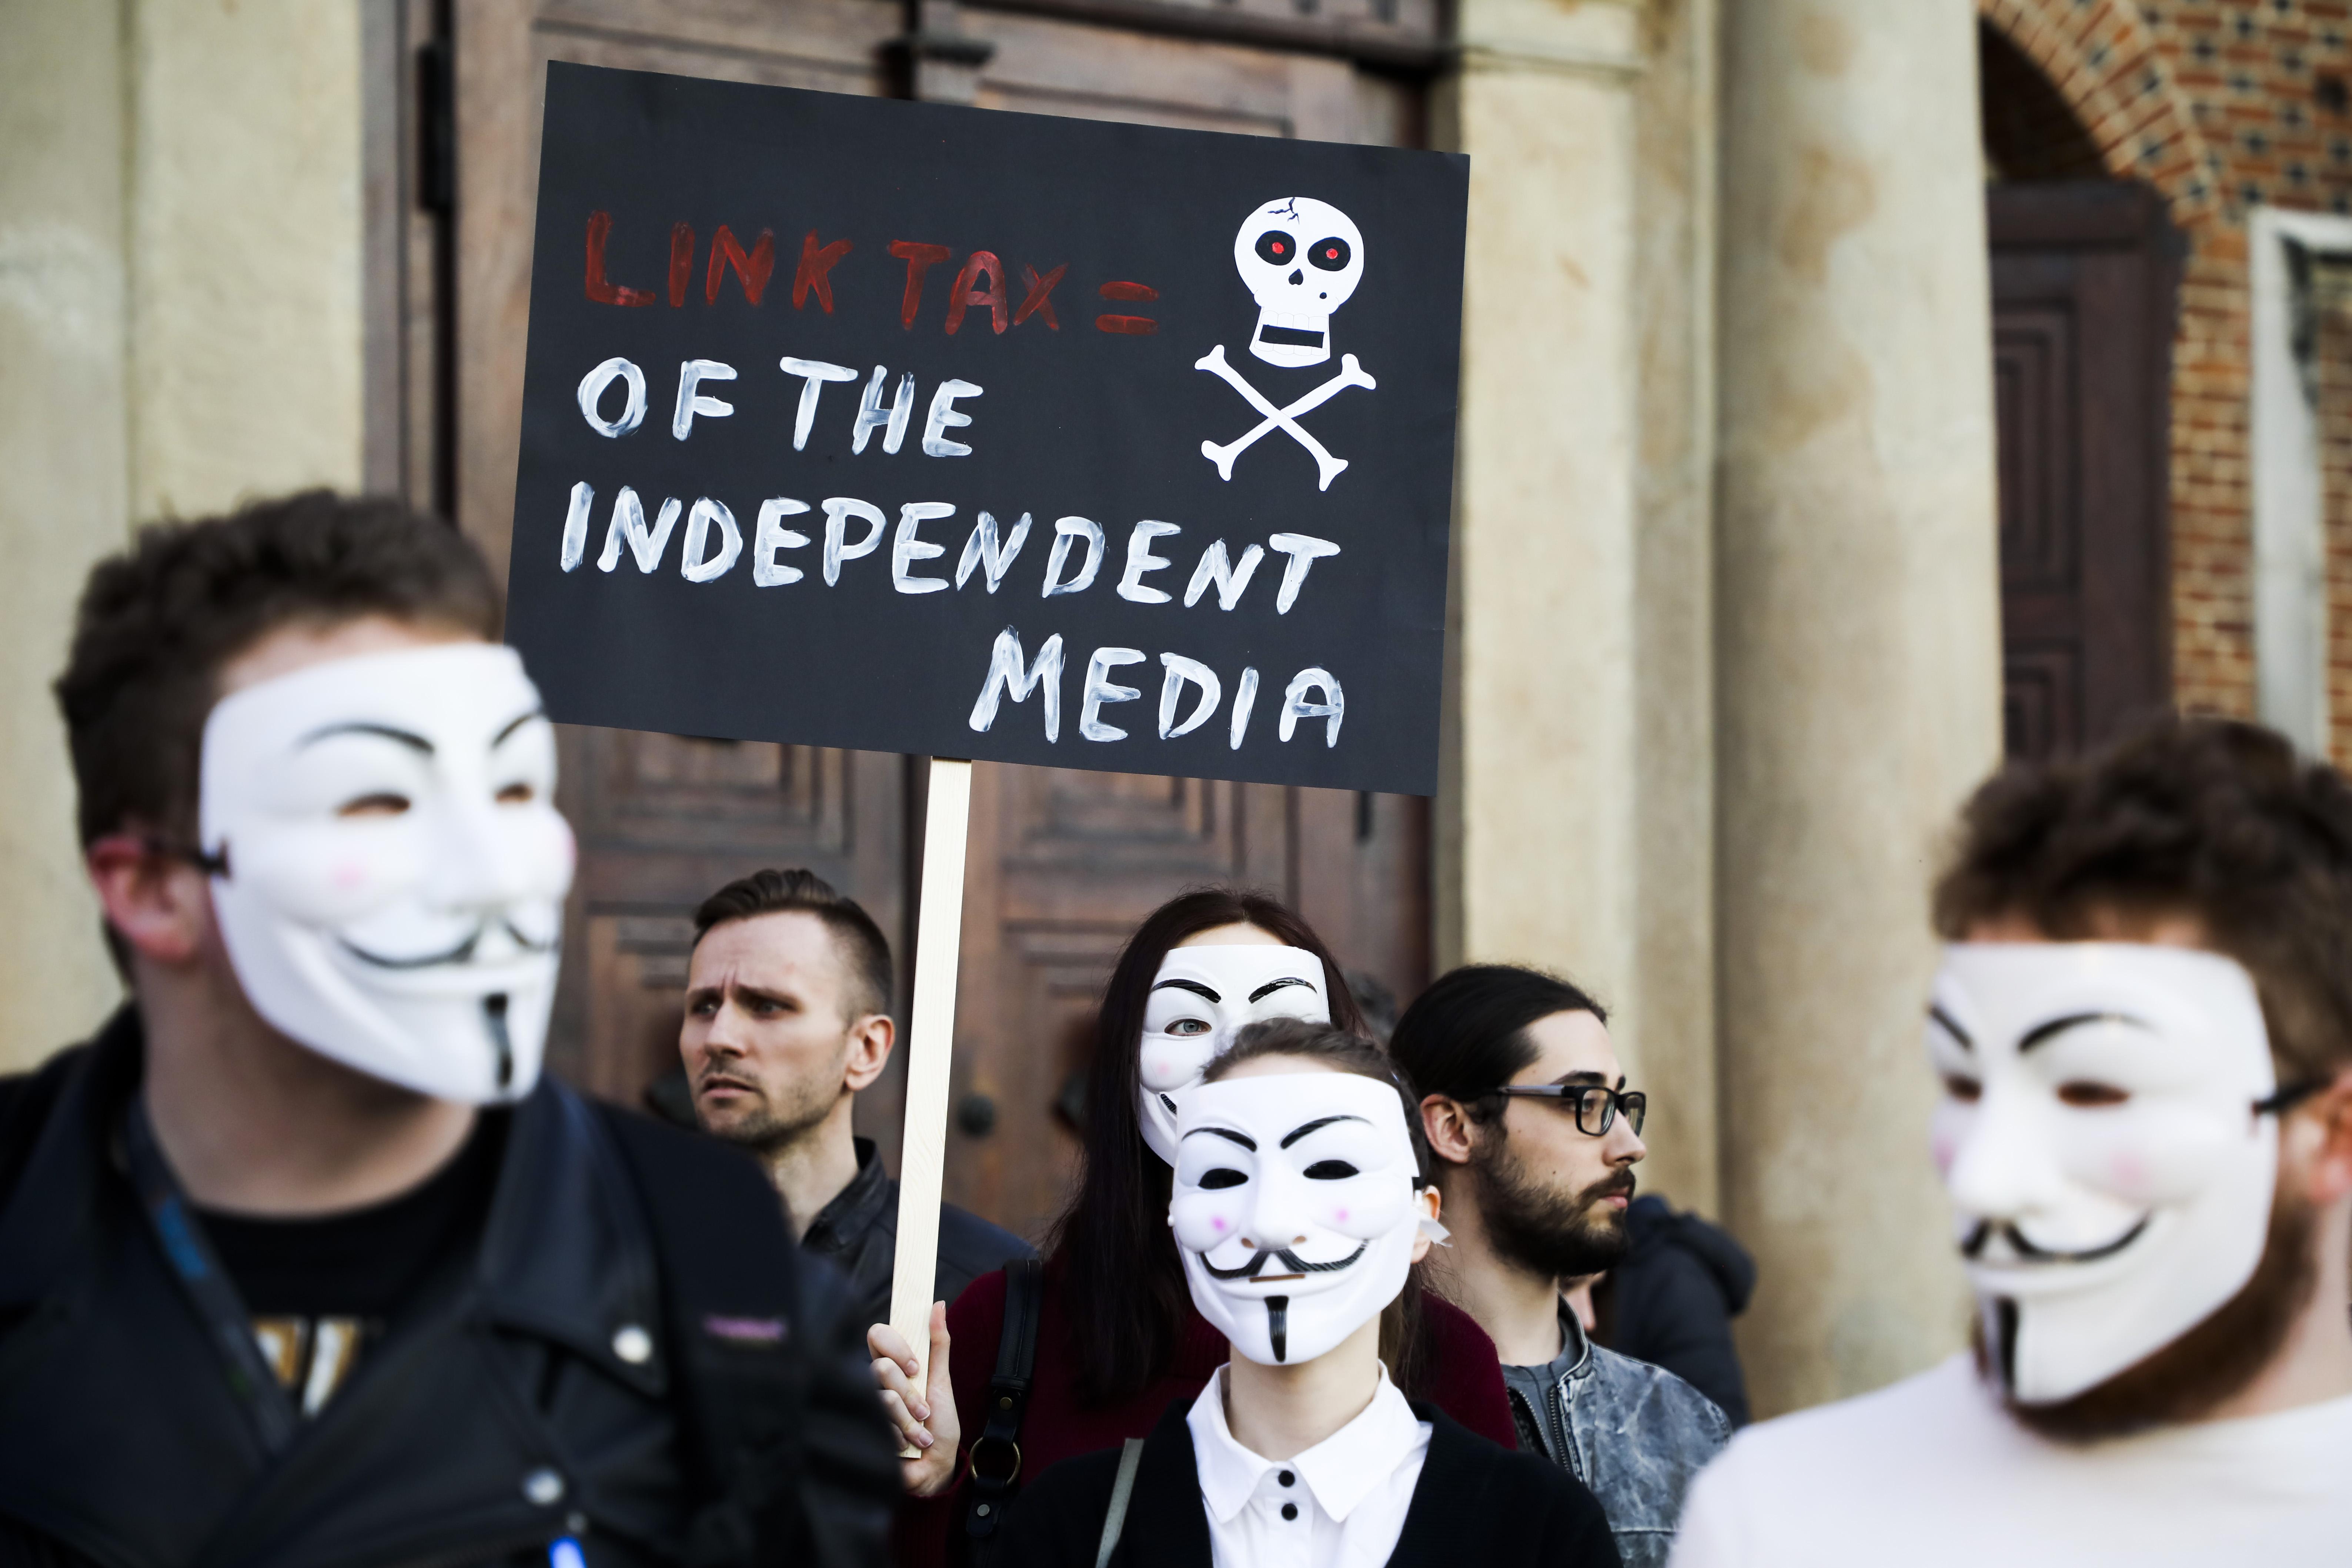 'Stop ACTA 2' Protest In Krakow